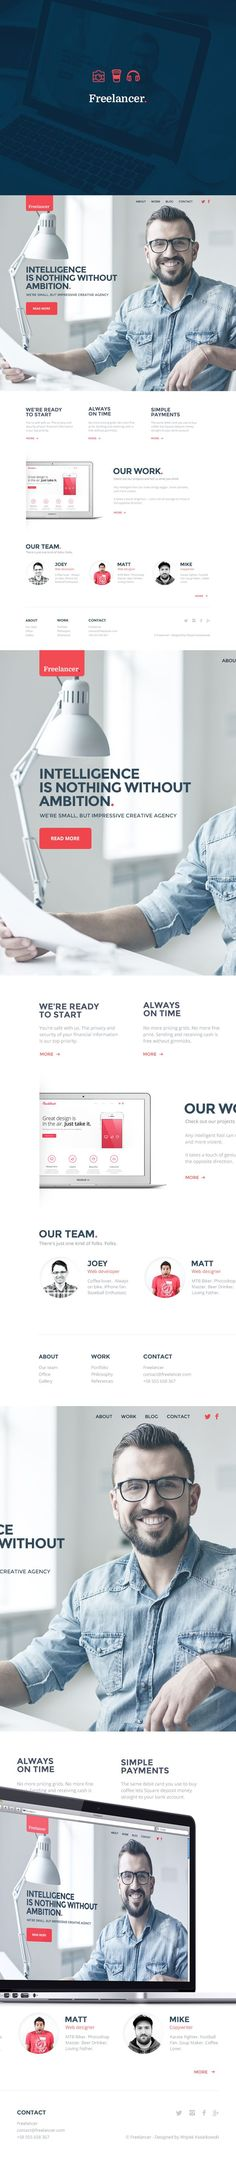 Un disseny web excel·lent per fer una presentació personal #personal #webdesign #web. If you like UX, design, or design thinking, check out theuxblog.com